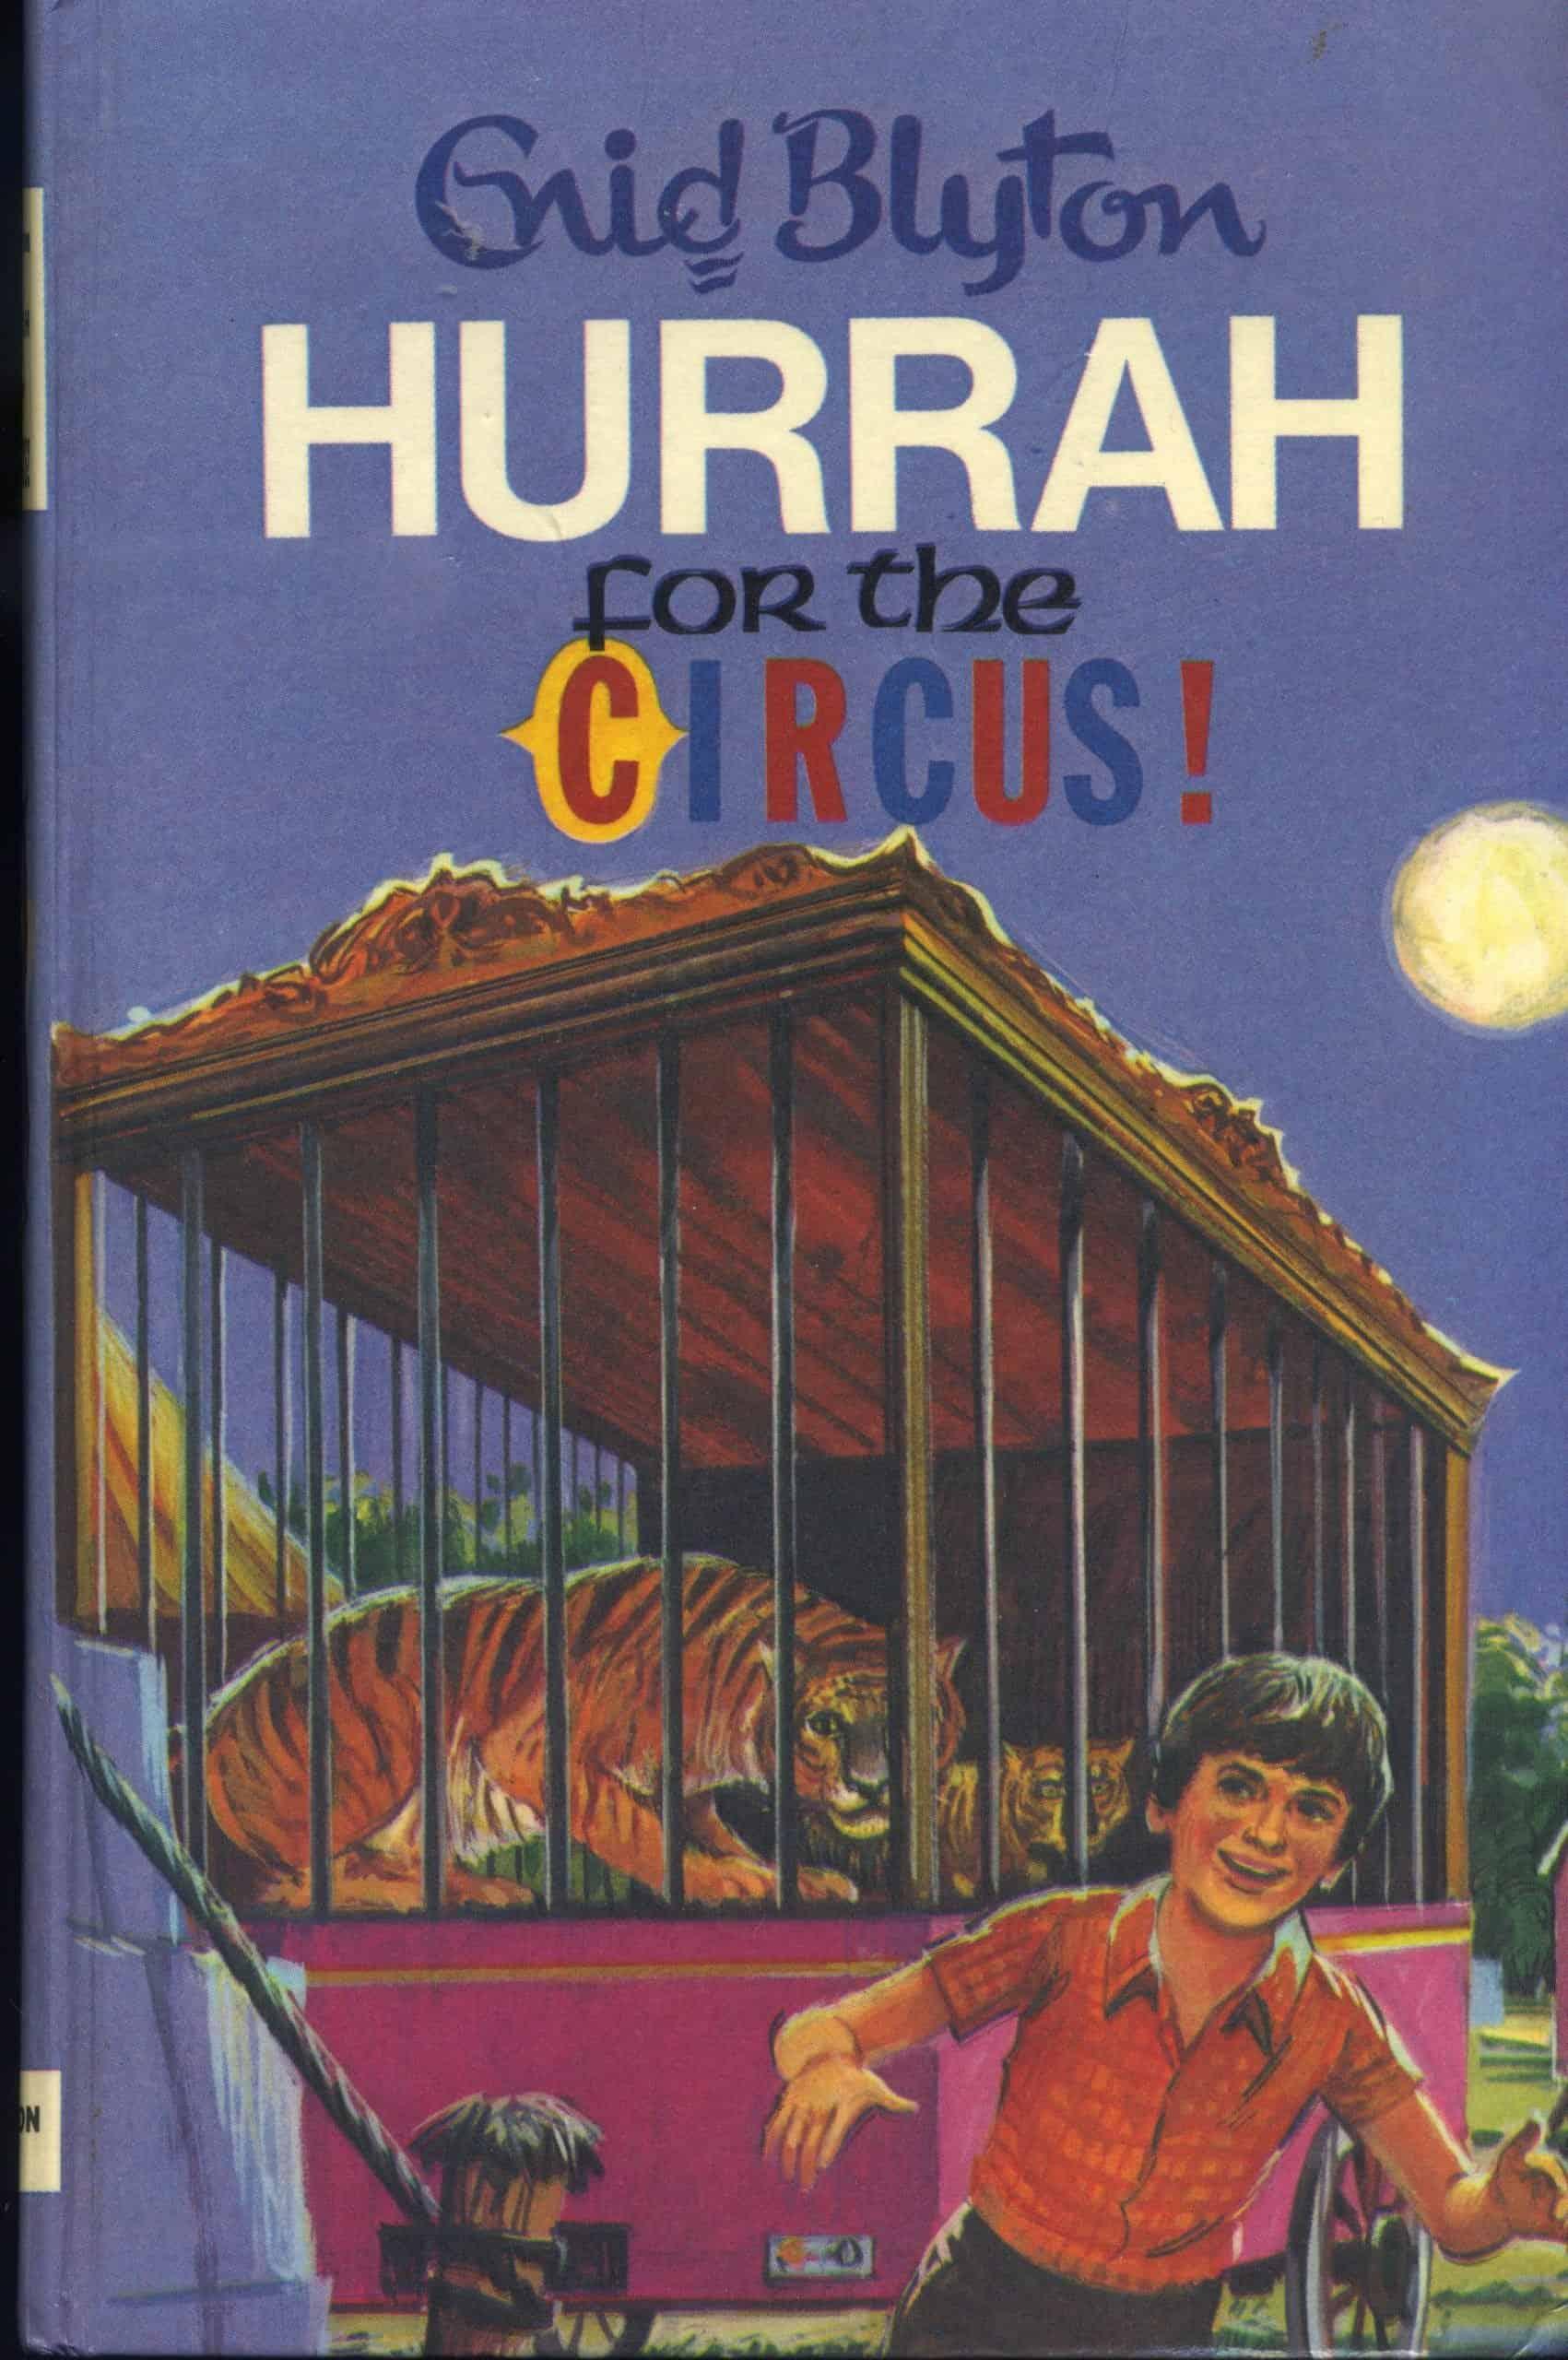 Hurrah for the Circus Book Cover Enid Blyton